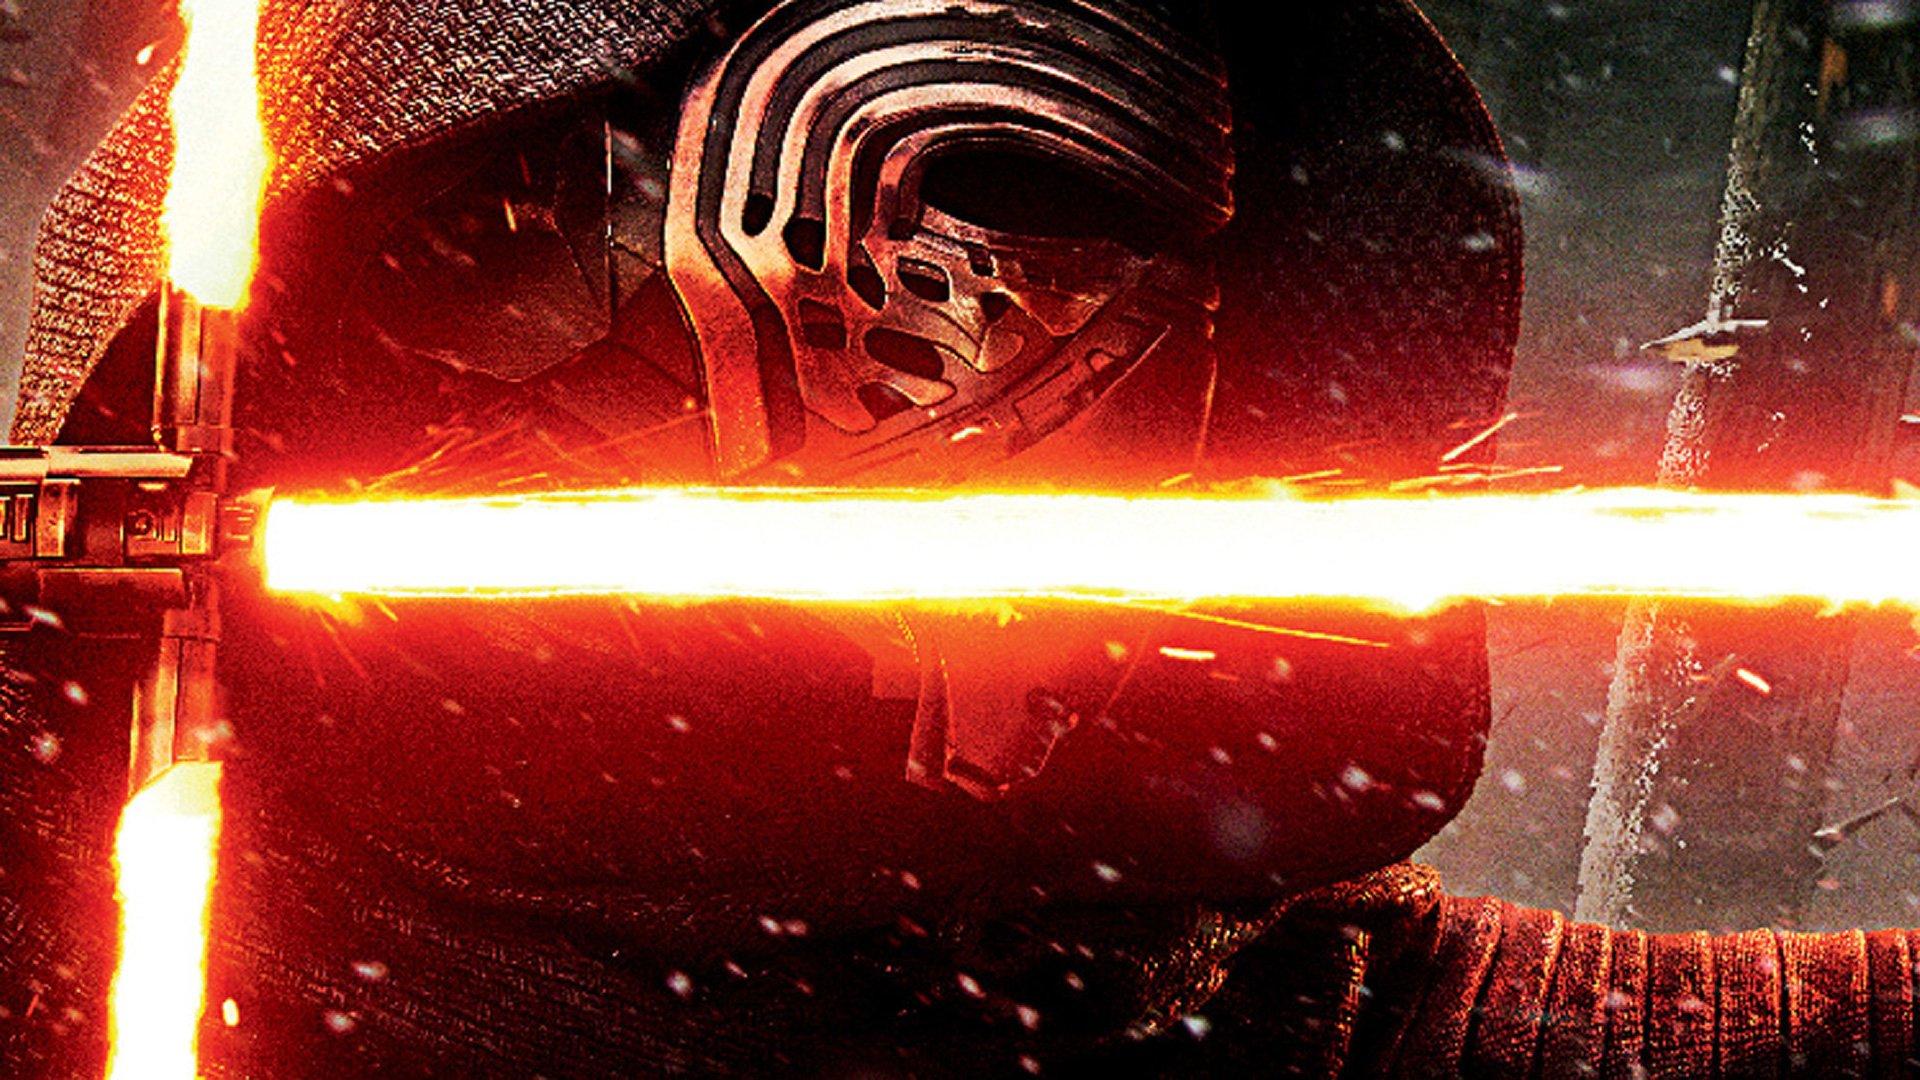 star wars episode vii the force awakens full hd wallpaper